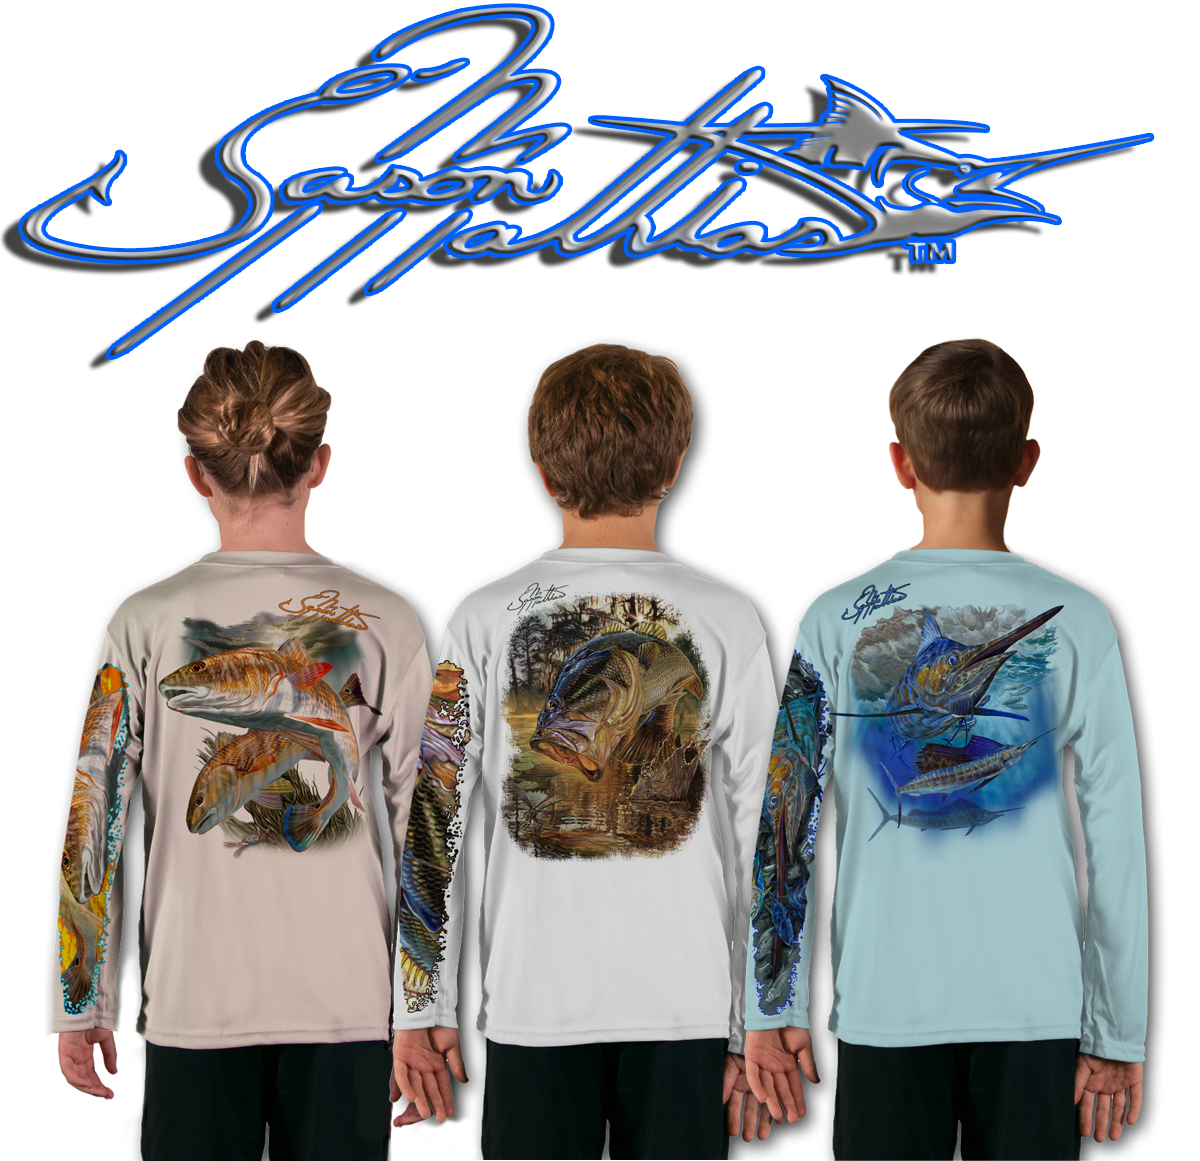 jason-mathias-kids-t-shirts-gear-cool-apparel-boys-girls-fish-art-fishing-gamefish-sportfish-outdoor-performance-solar.png